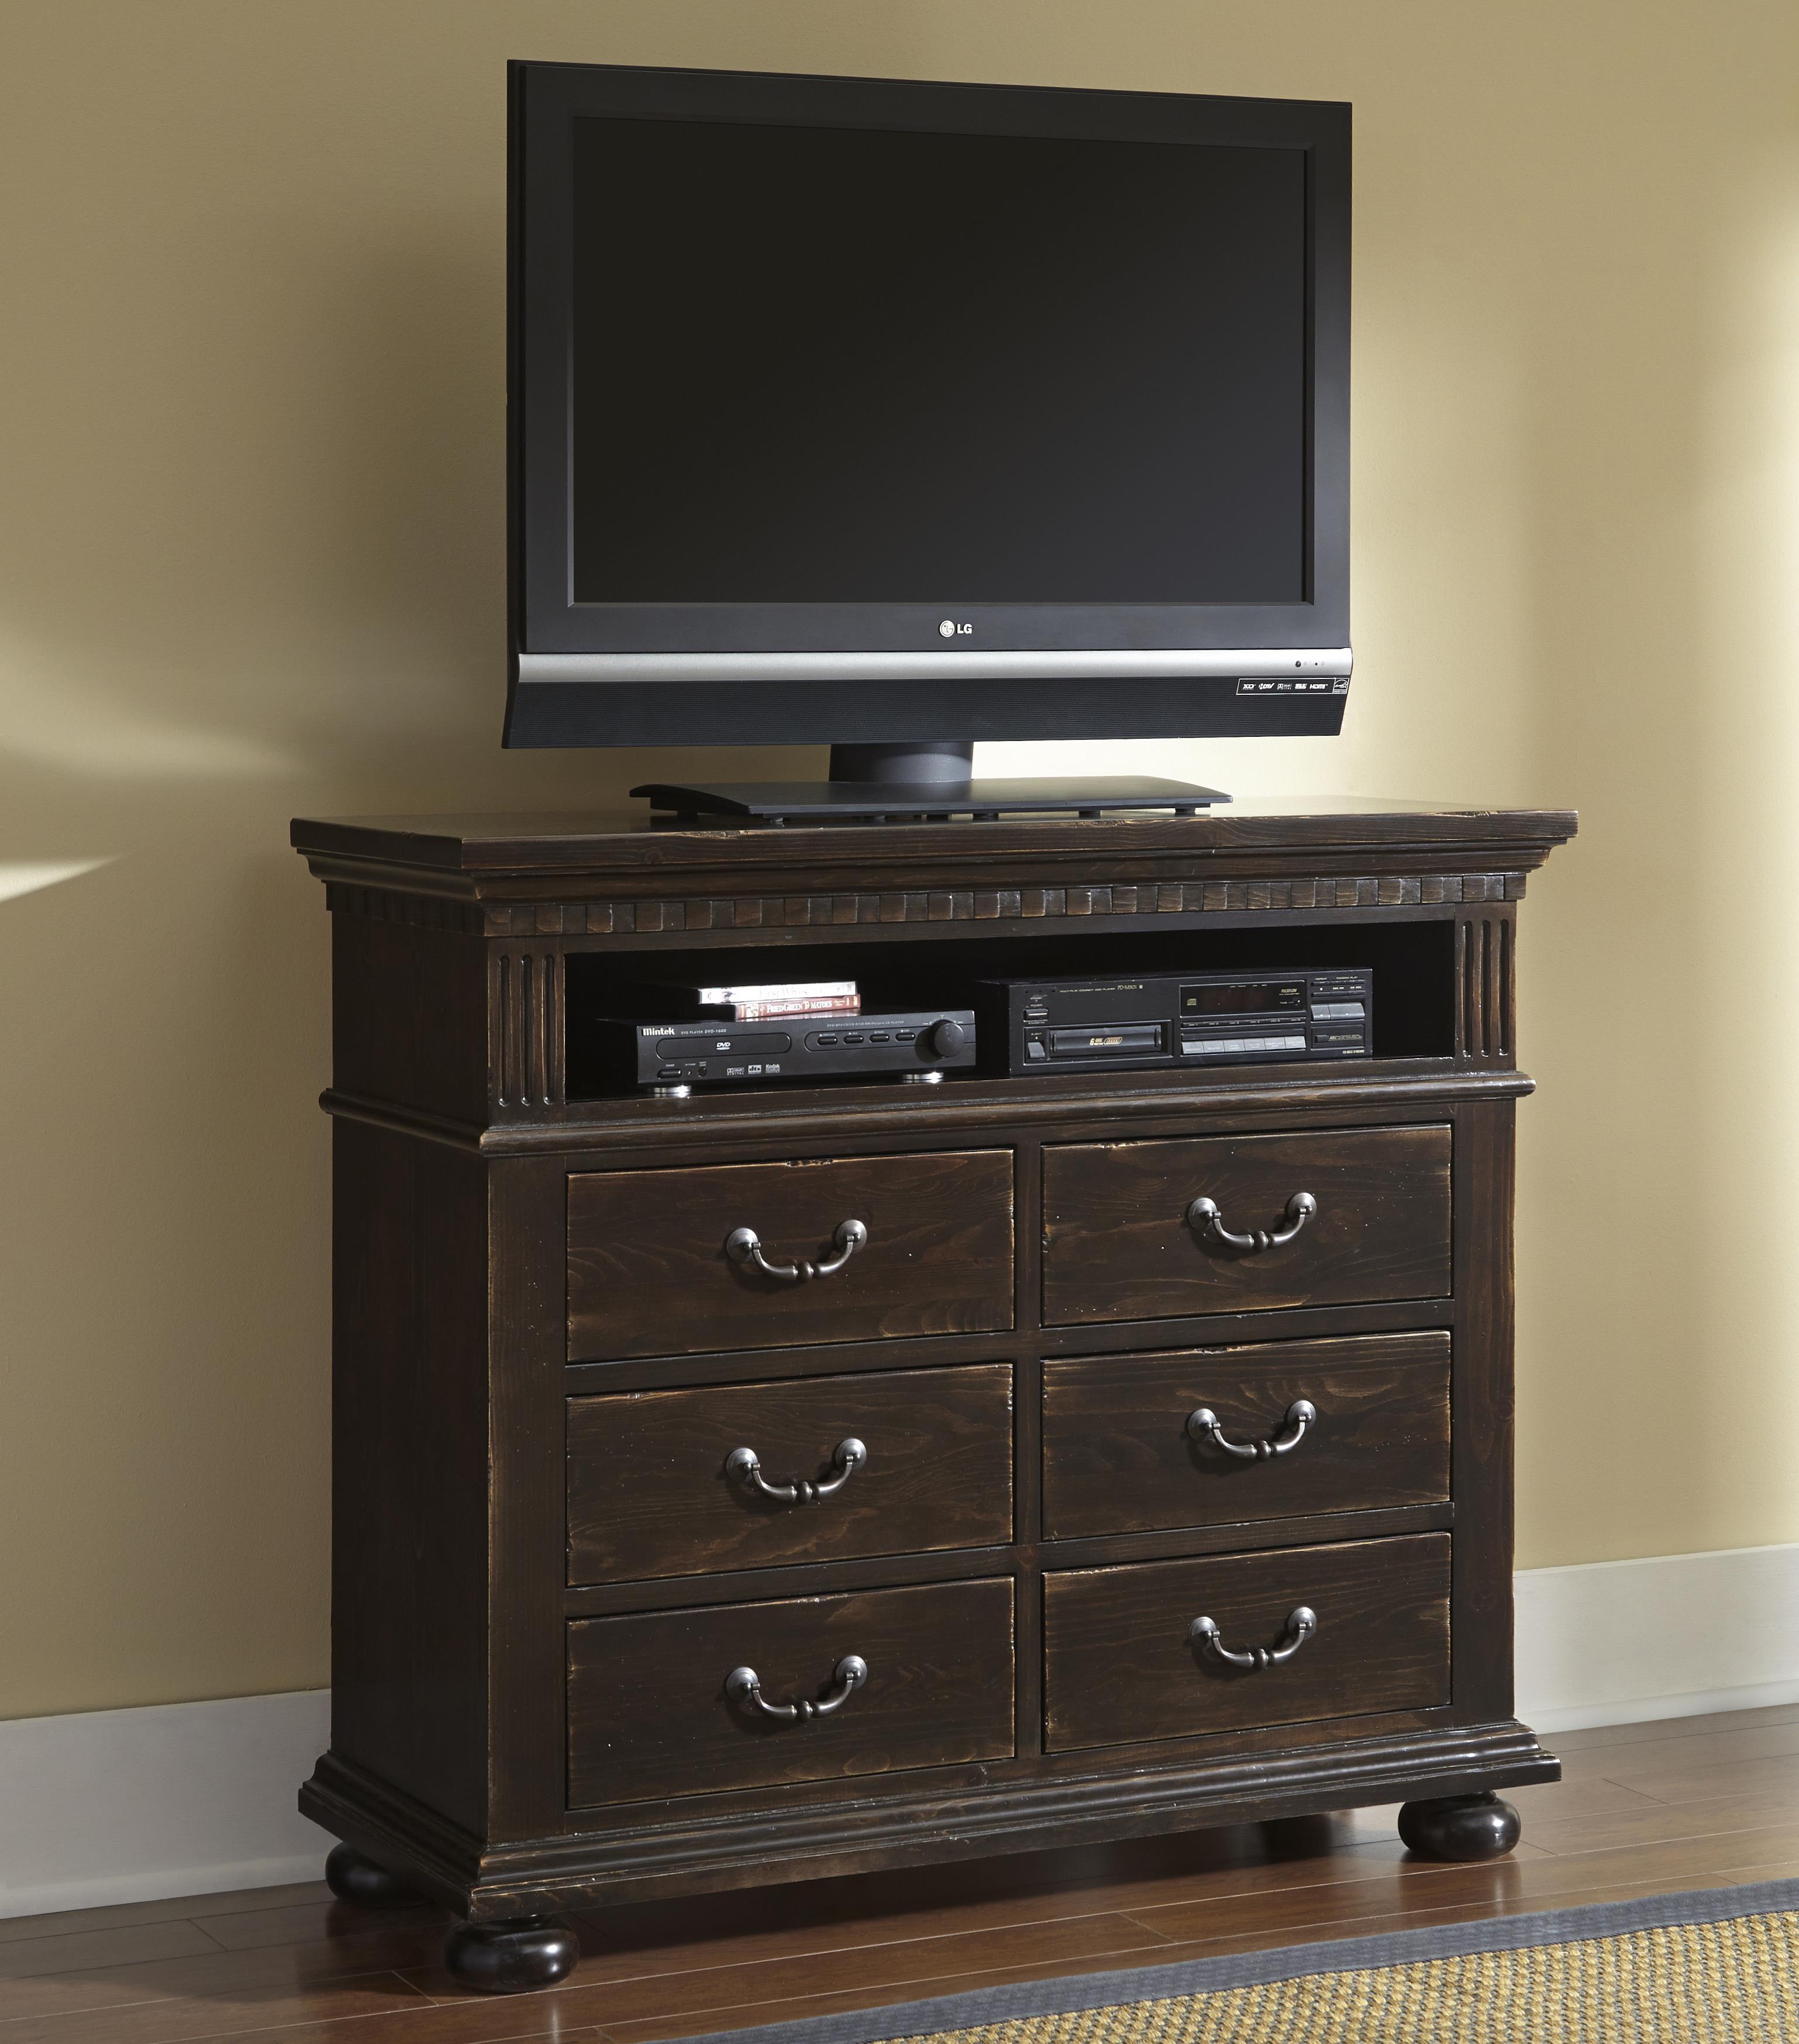 Progressive Furniture La Cantera Media Chest - Item Number: P665-46